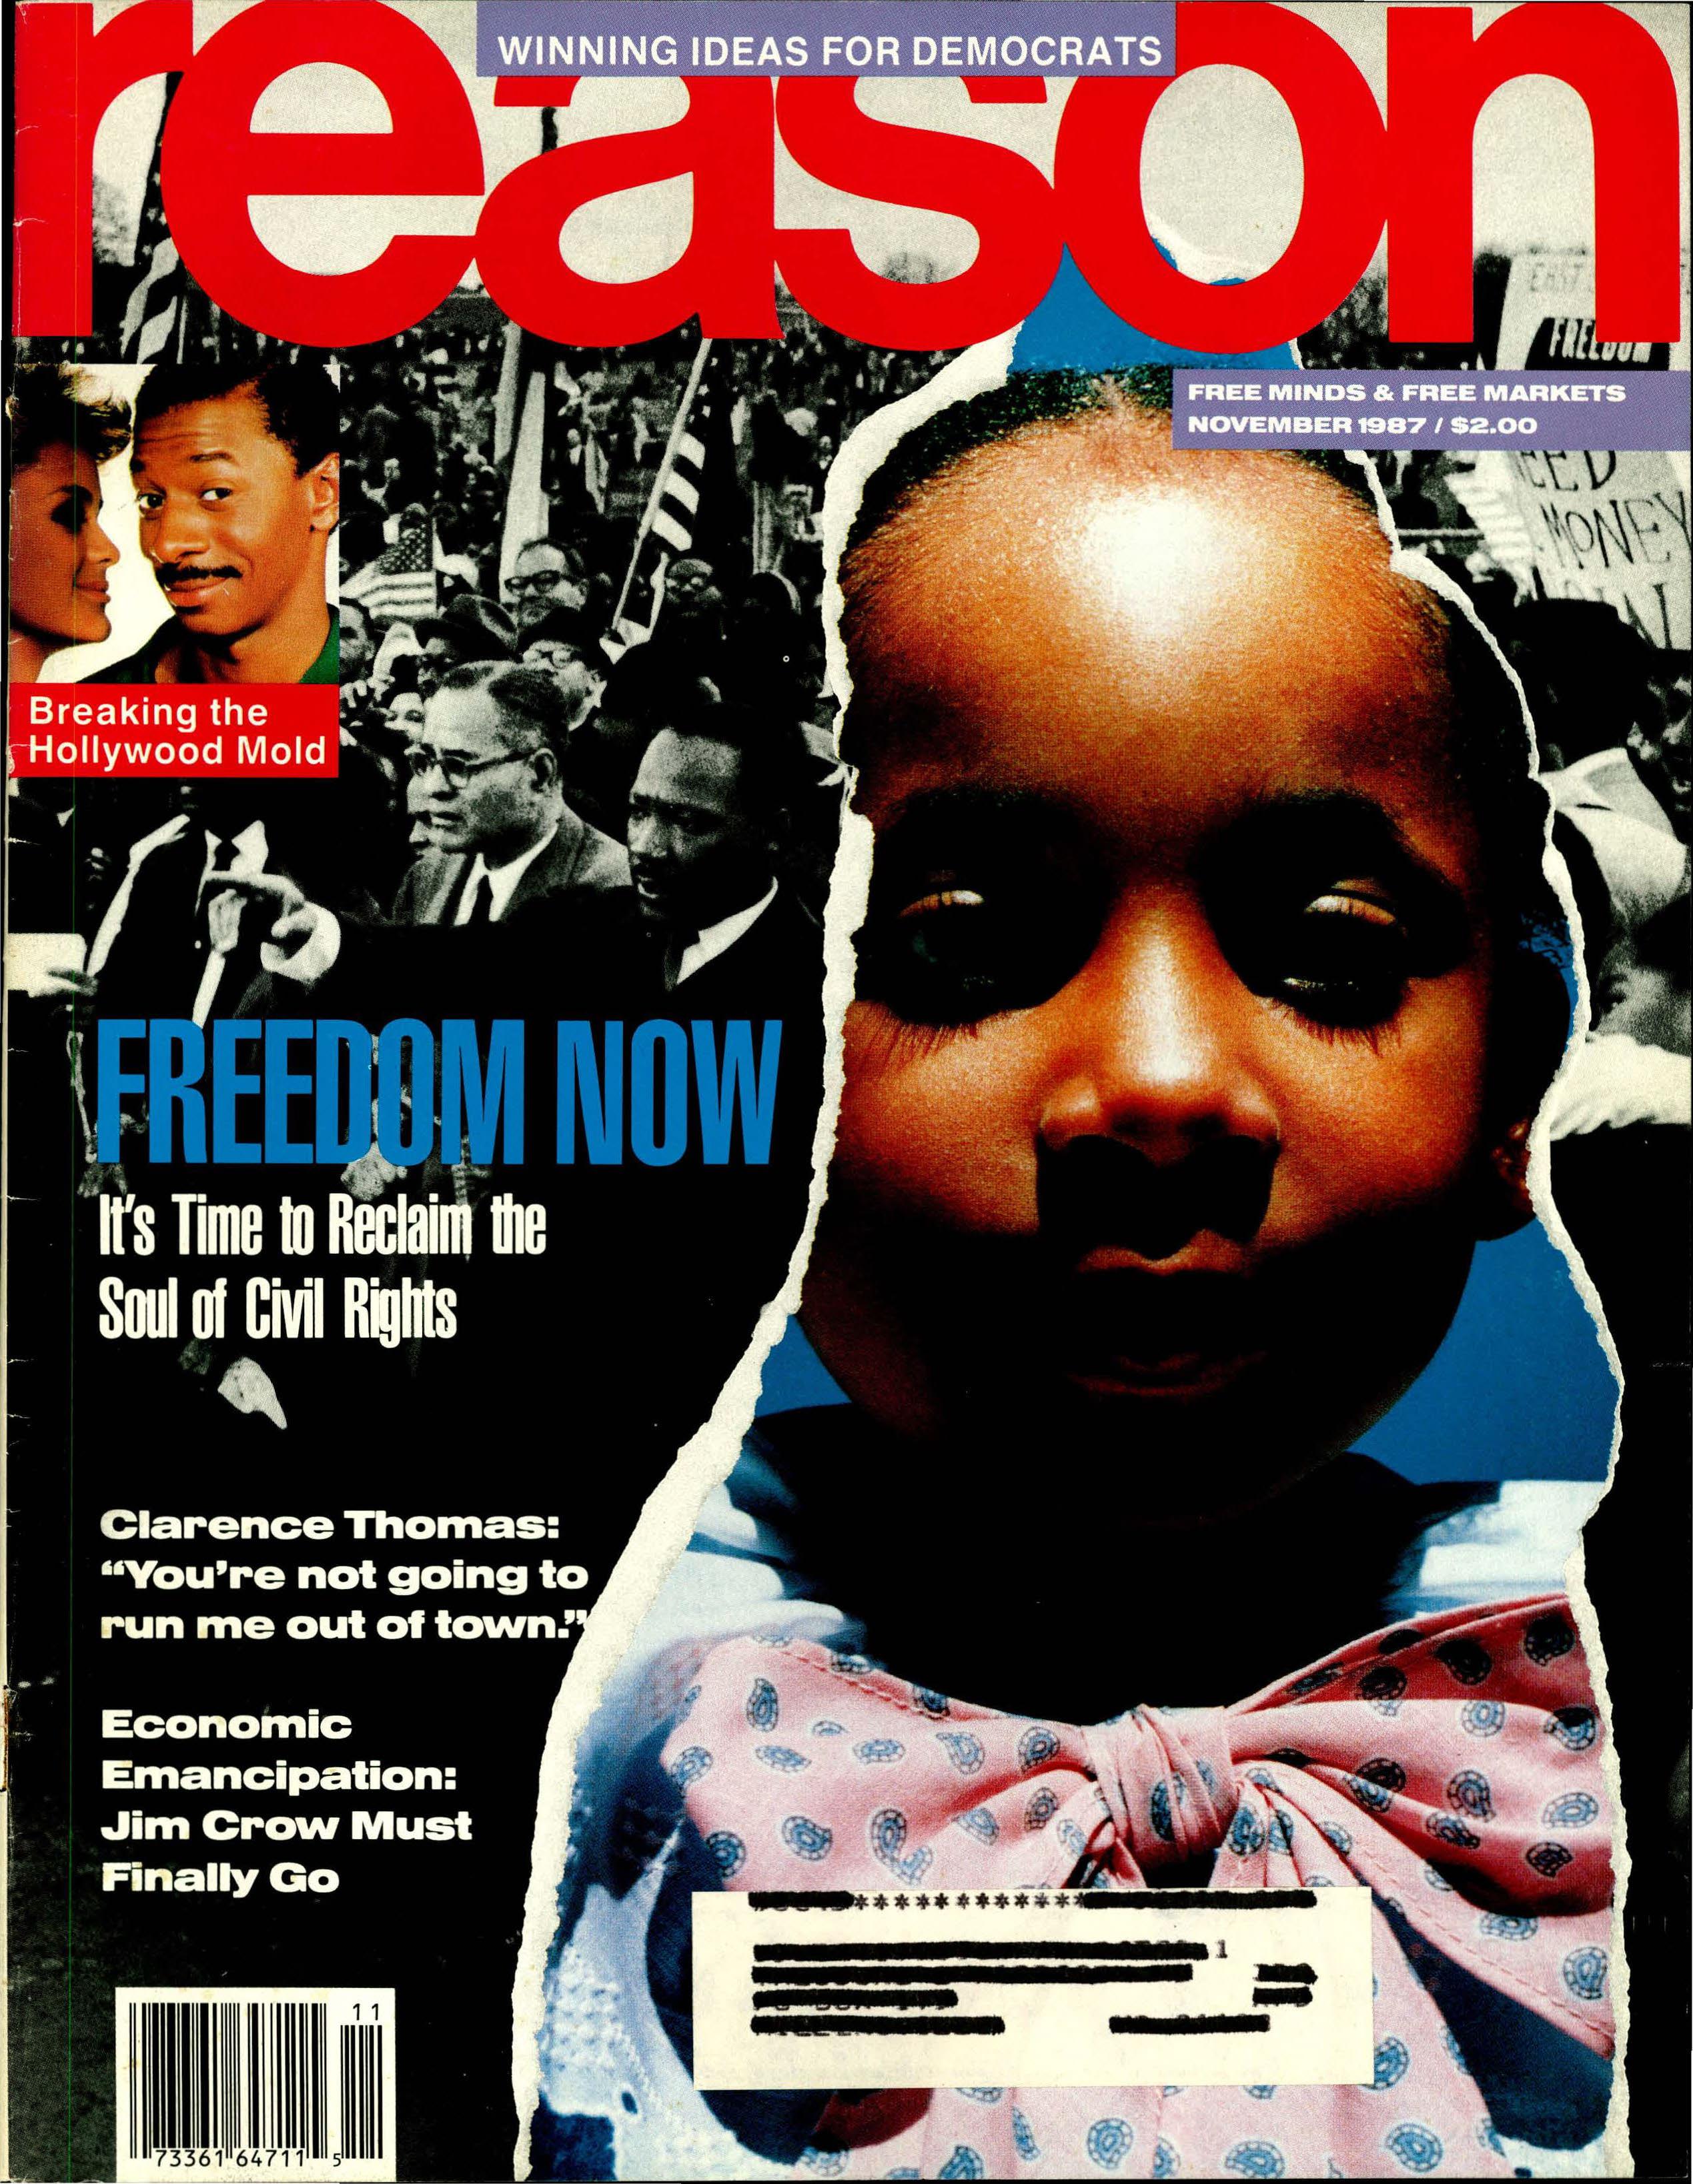 Reason Magazine, November 1987 cover image